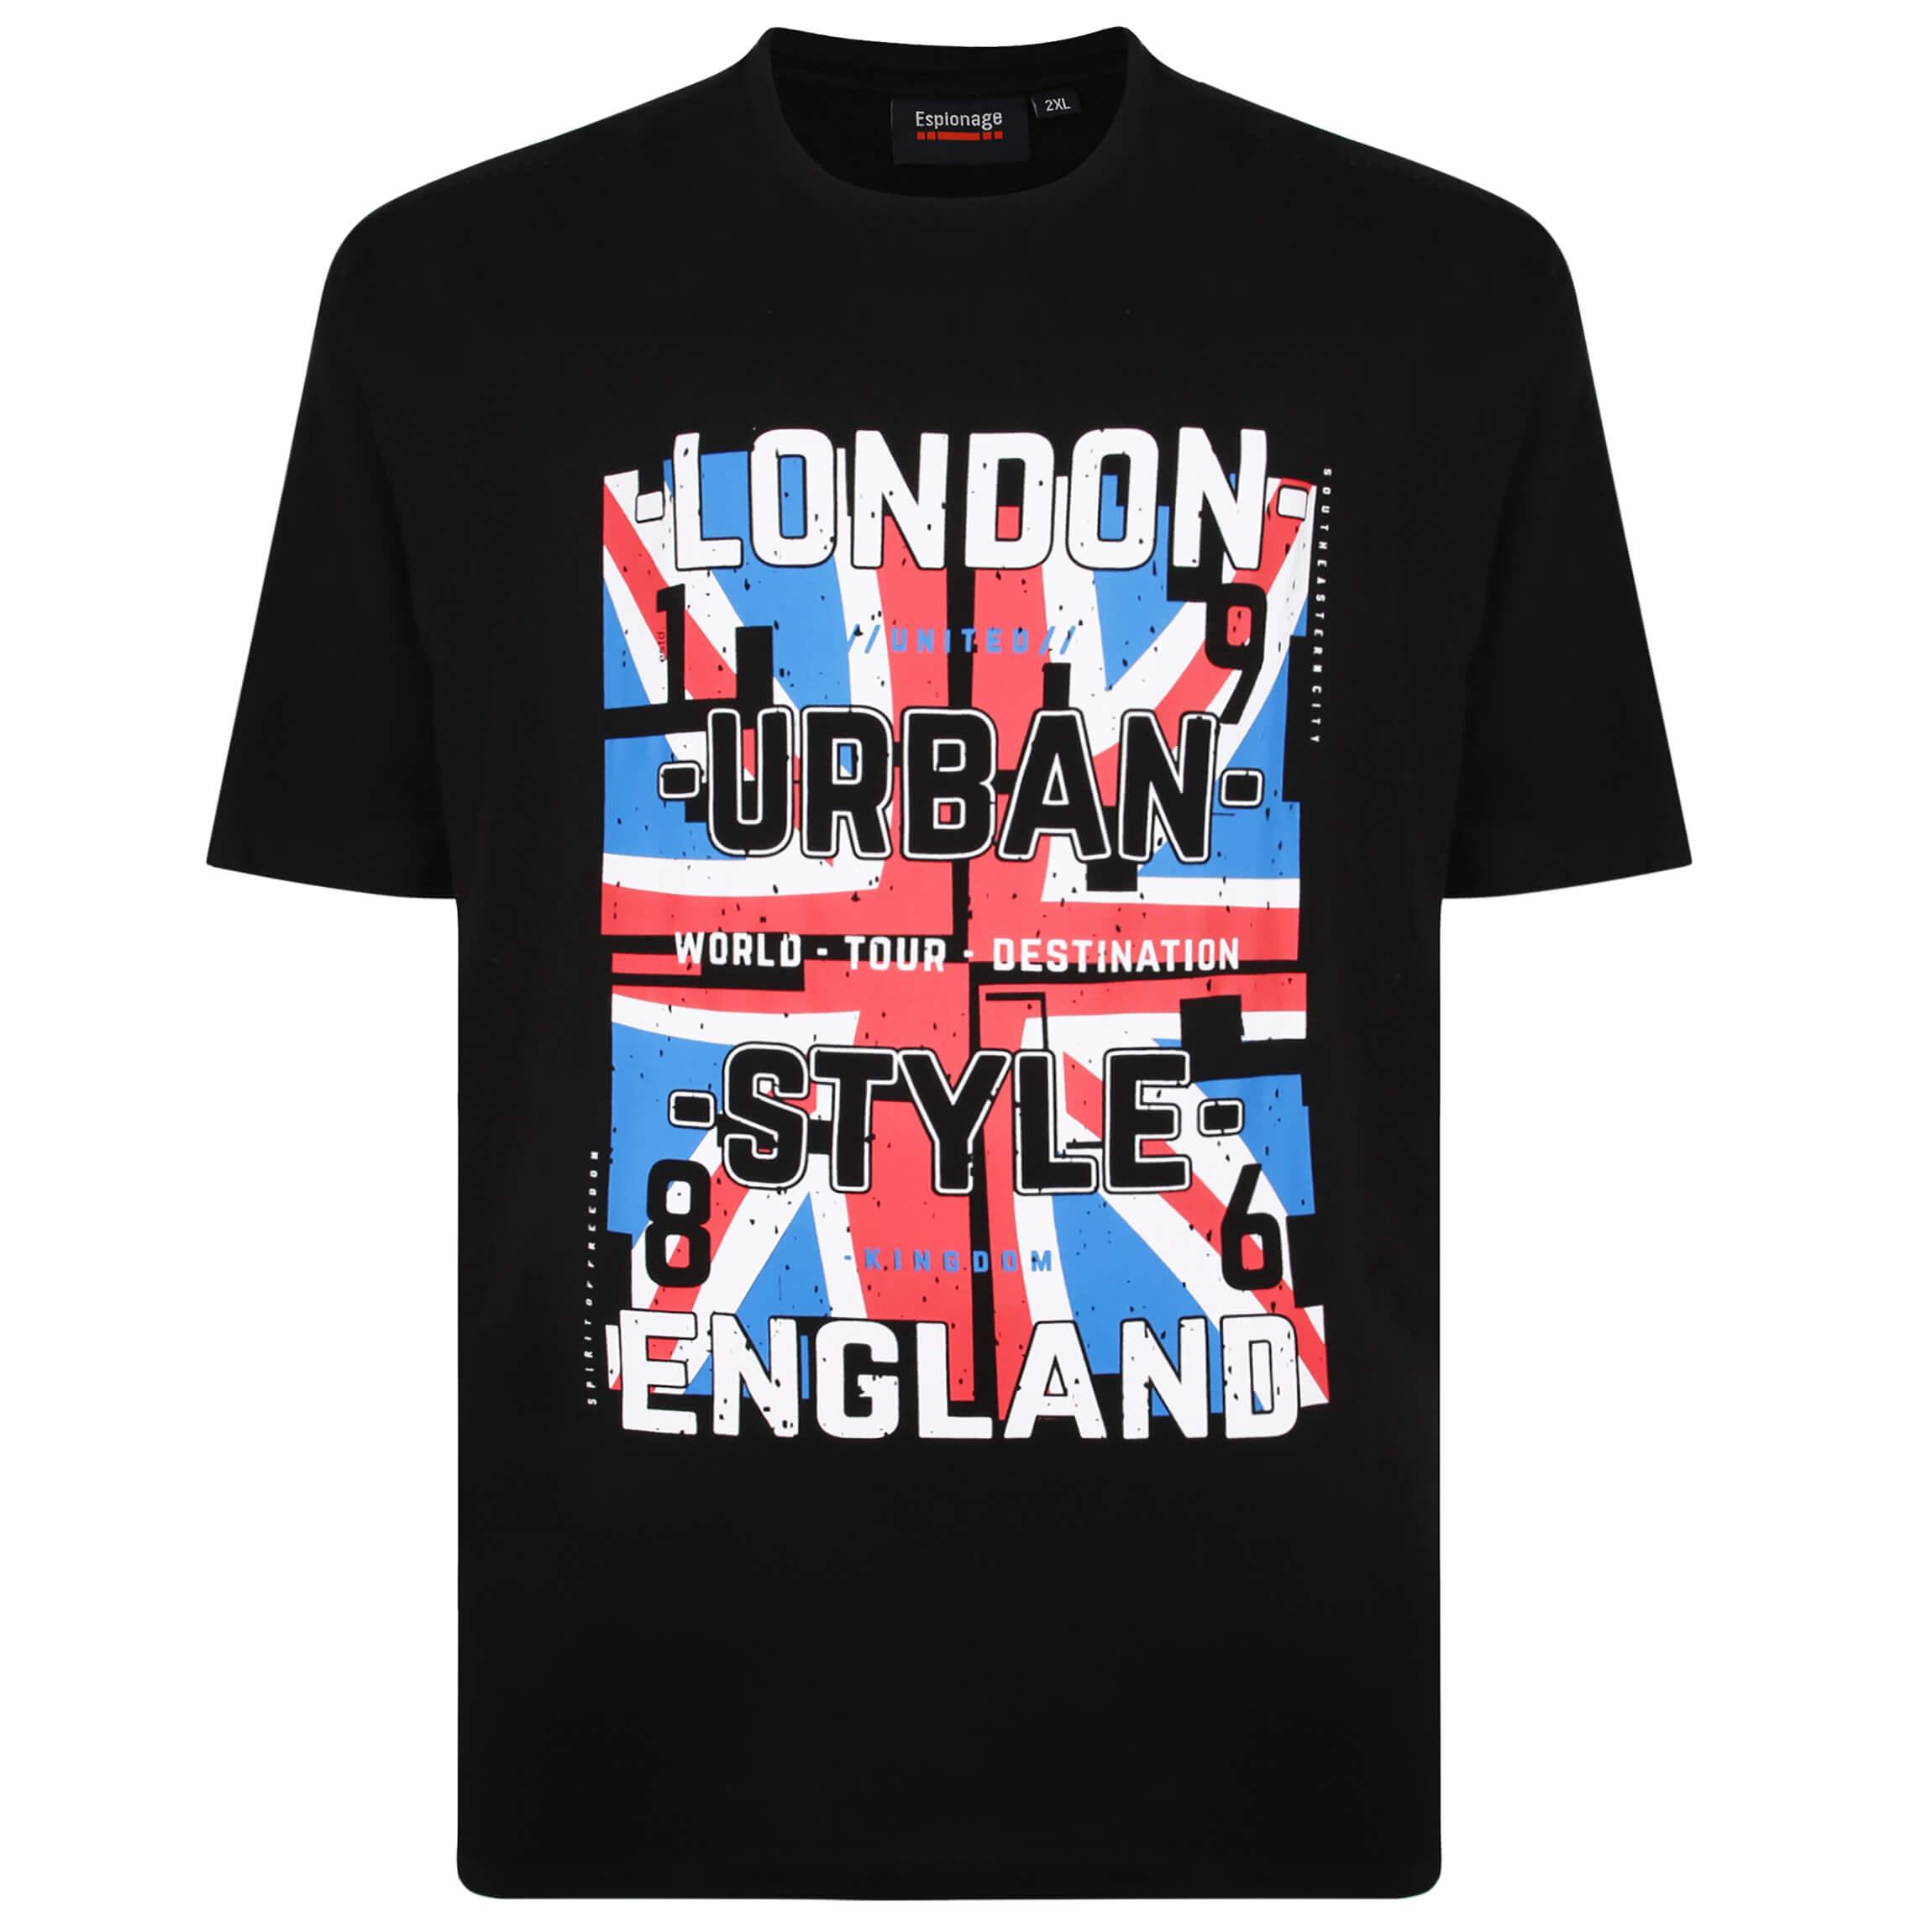 Espionage London Print Tee Shirt